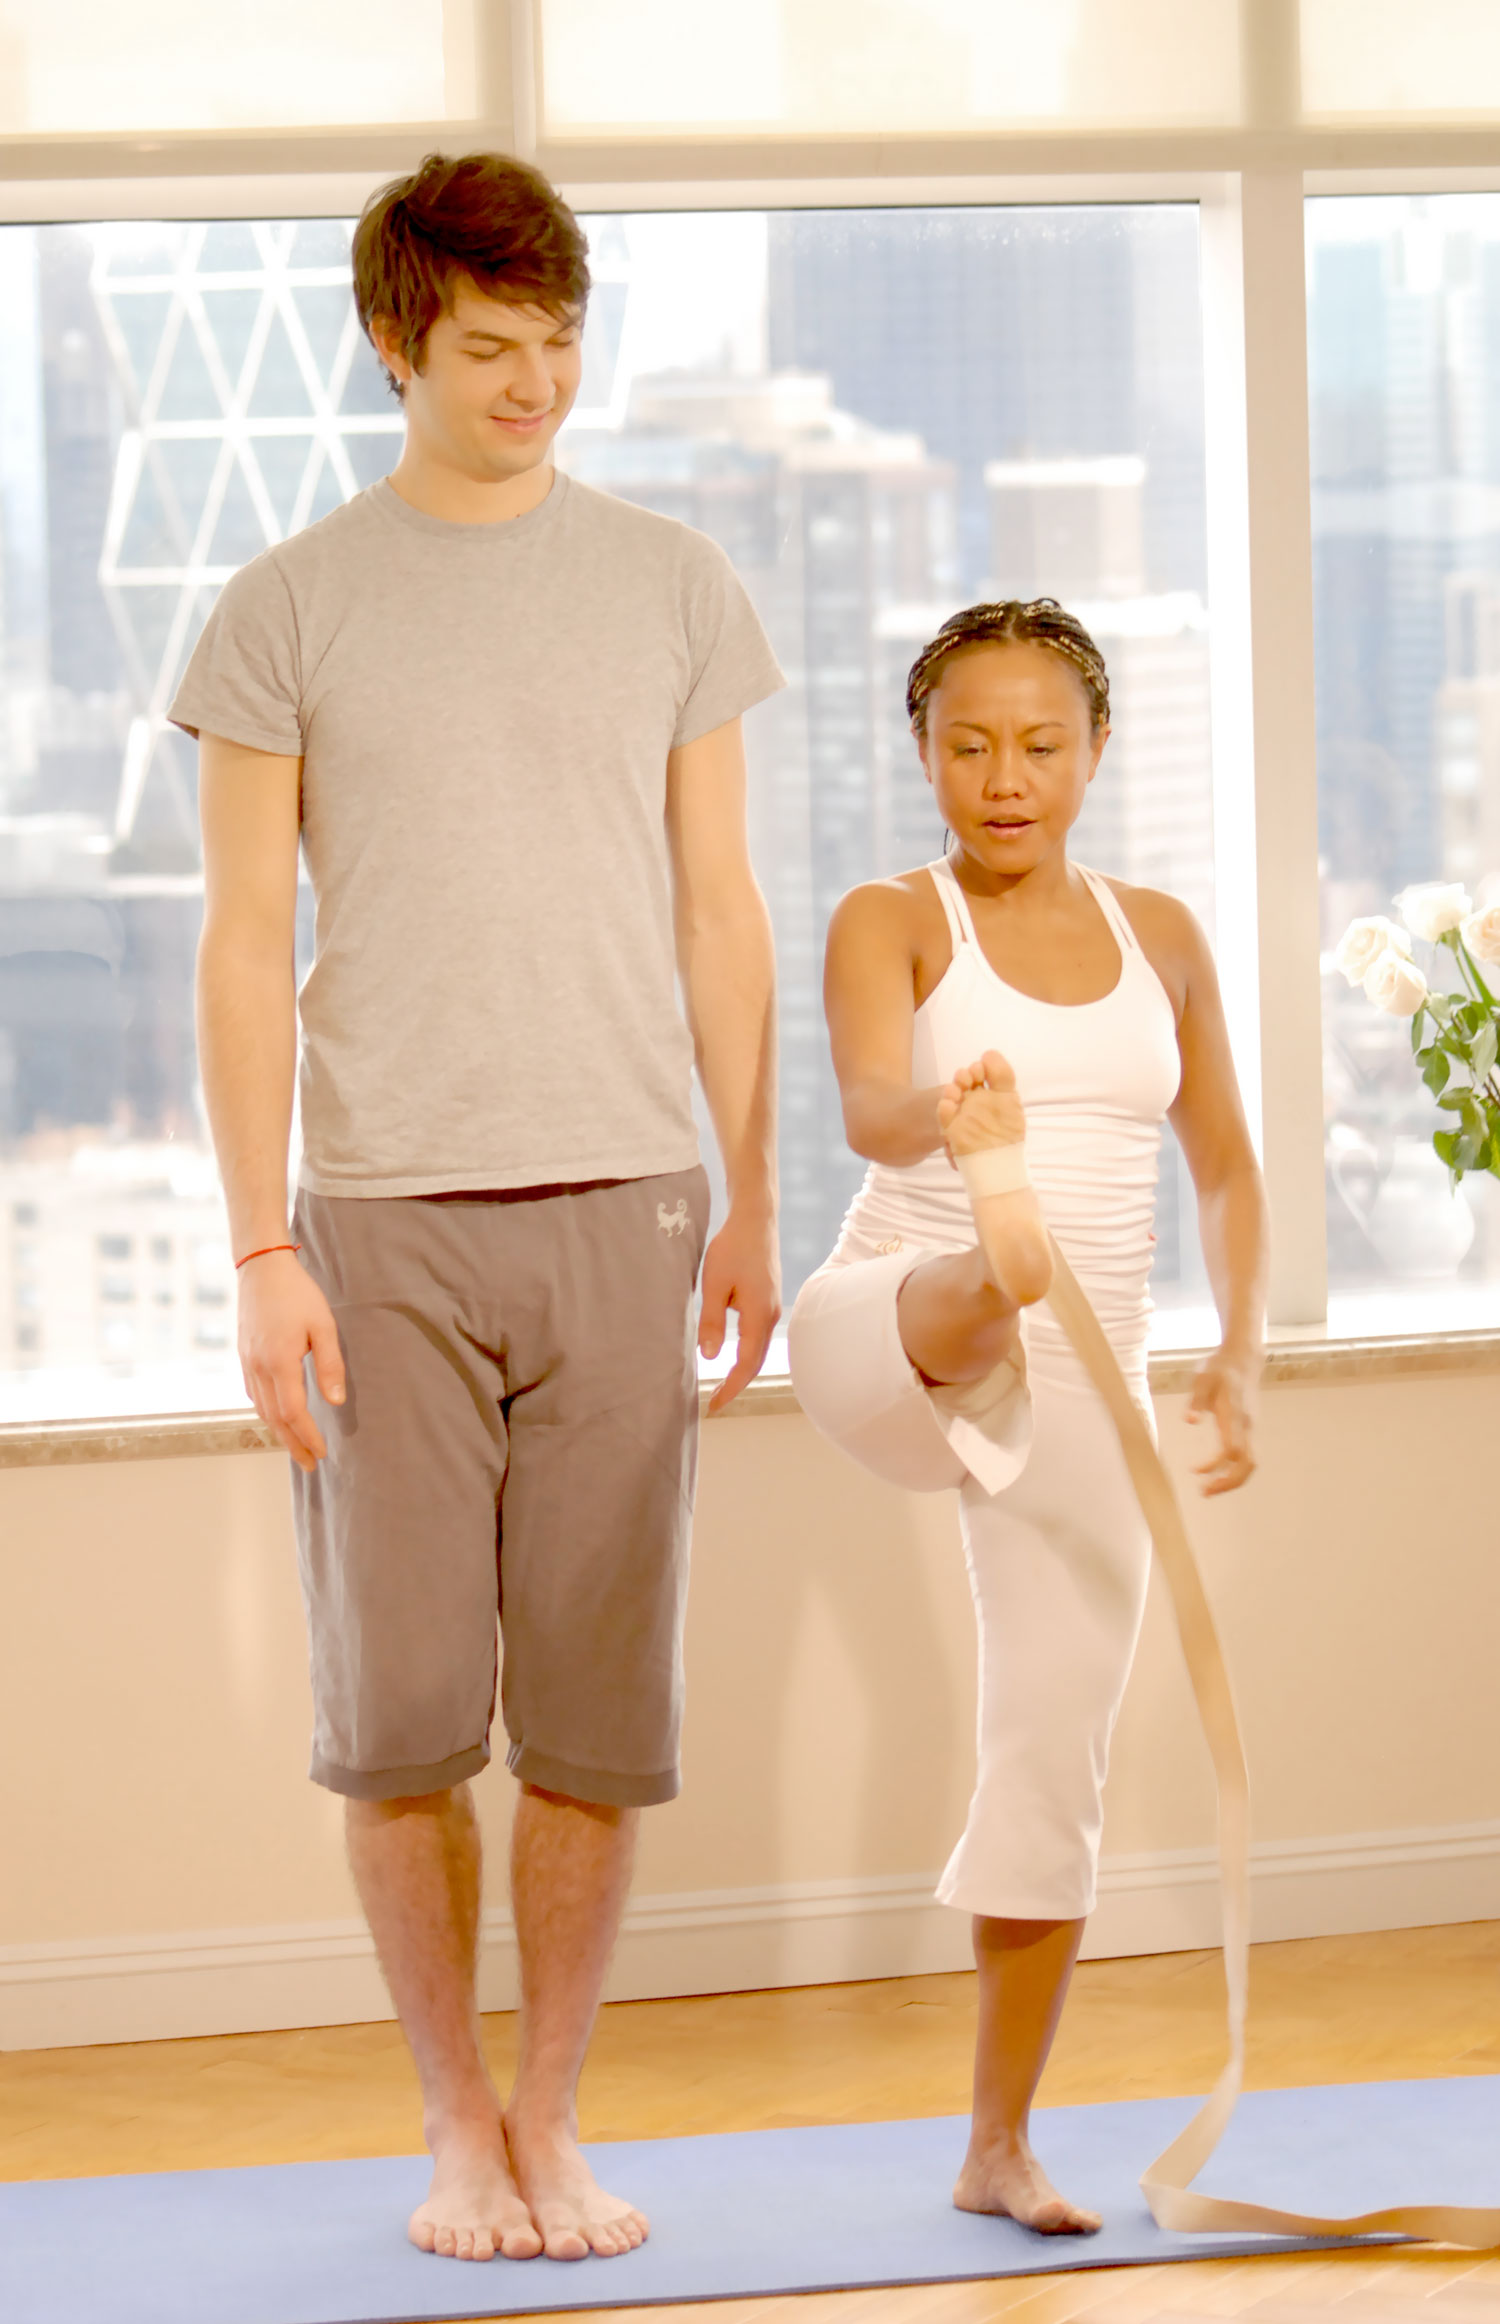 Yoga31.web.jpg